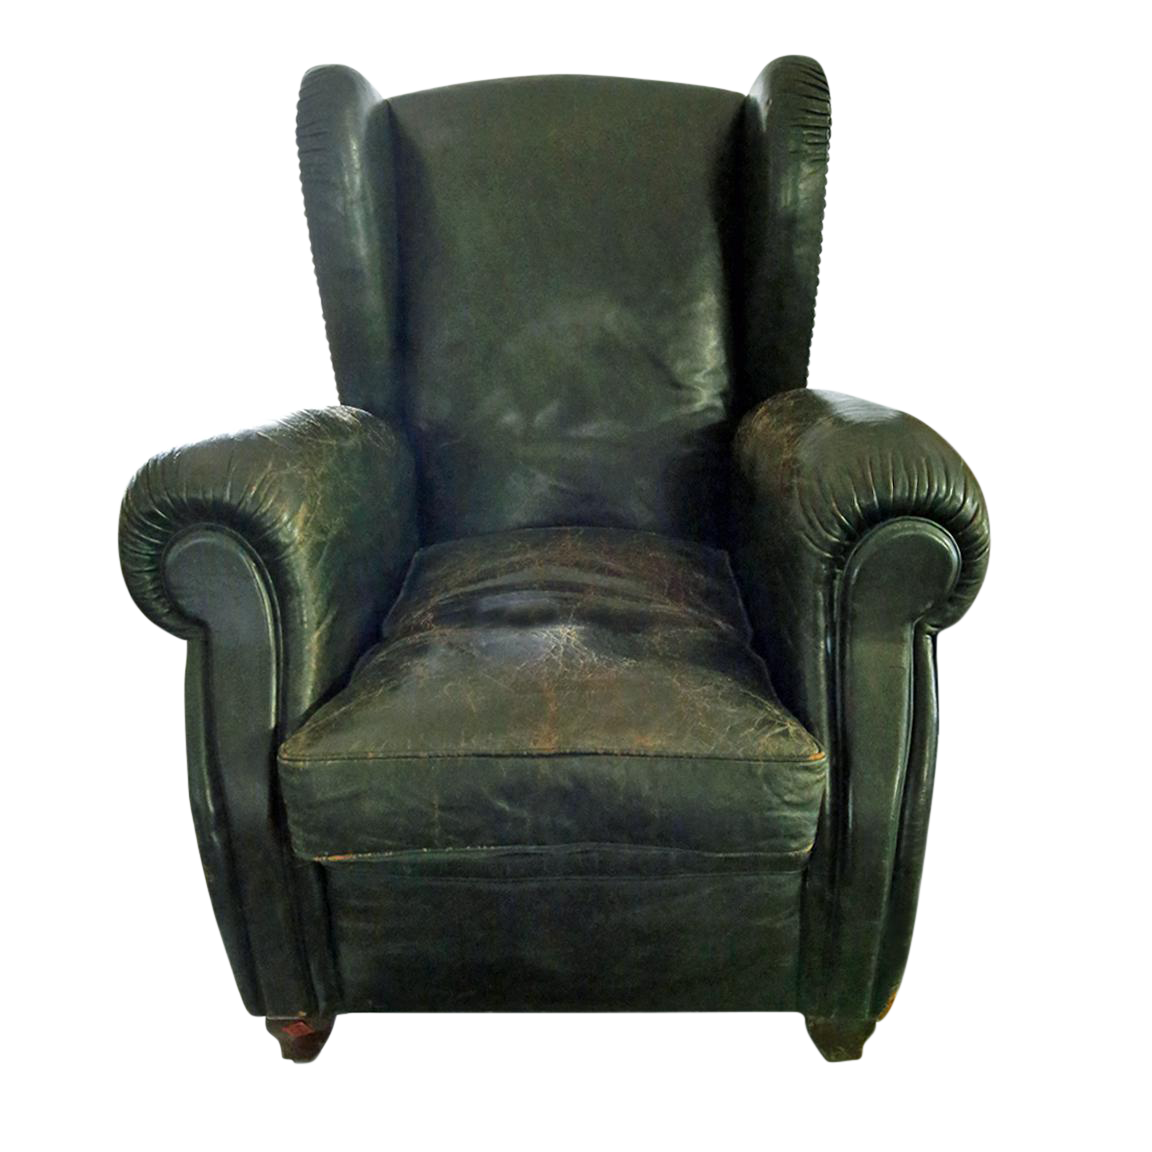 Vintage Green Leather Armchair | Chairish